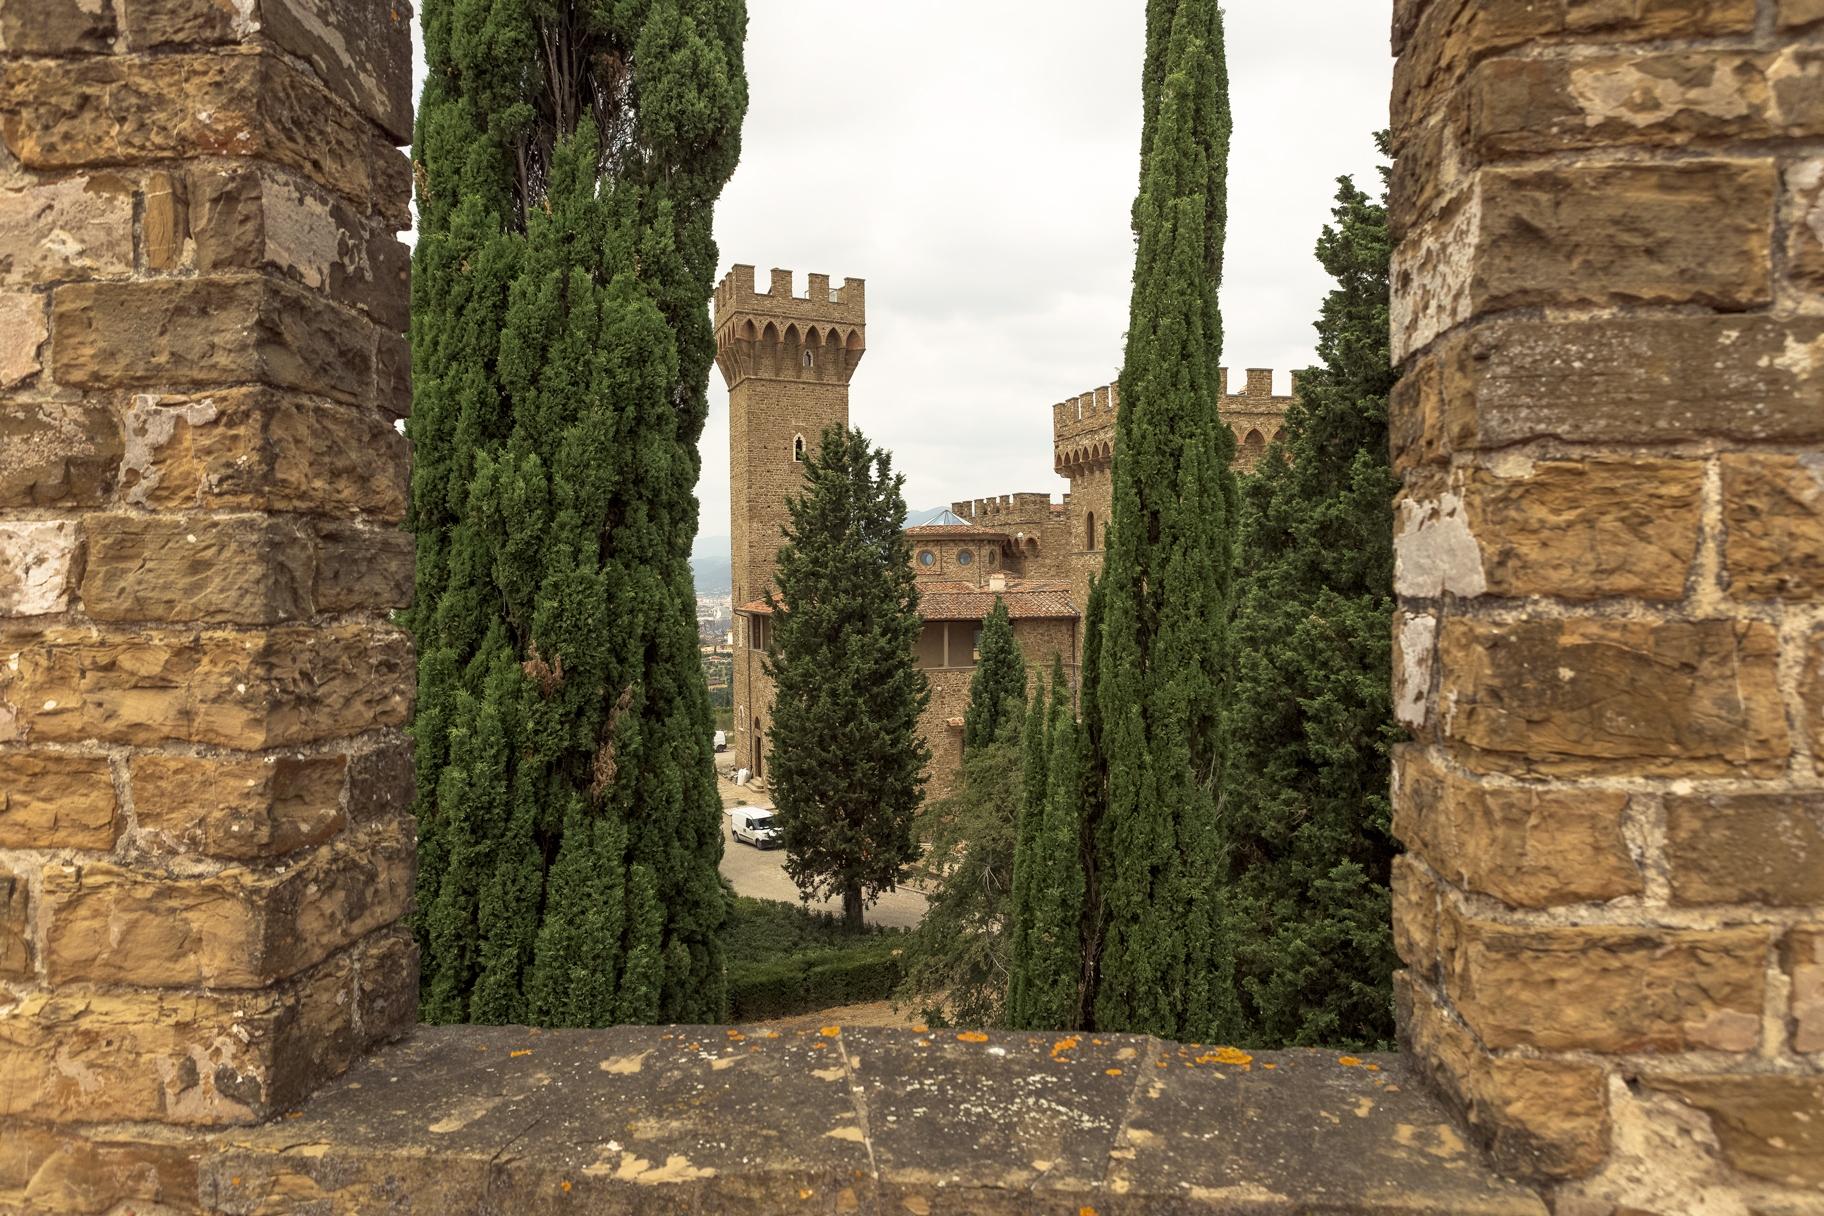 Attico in Vendita a Firenze: 5 locali, 250 mq - Foto 2